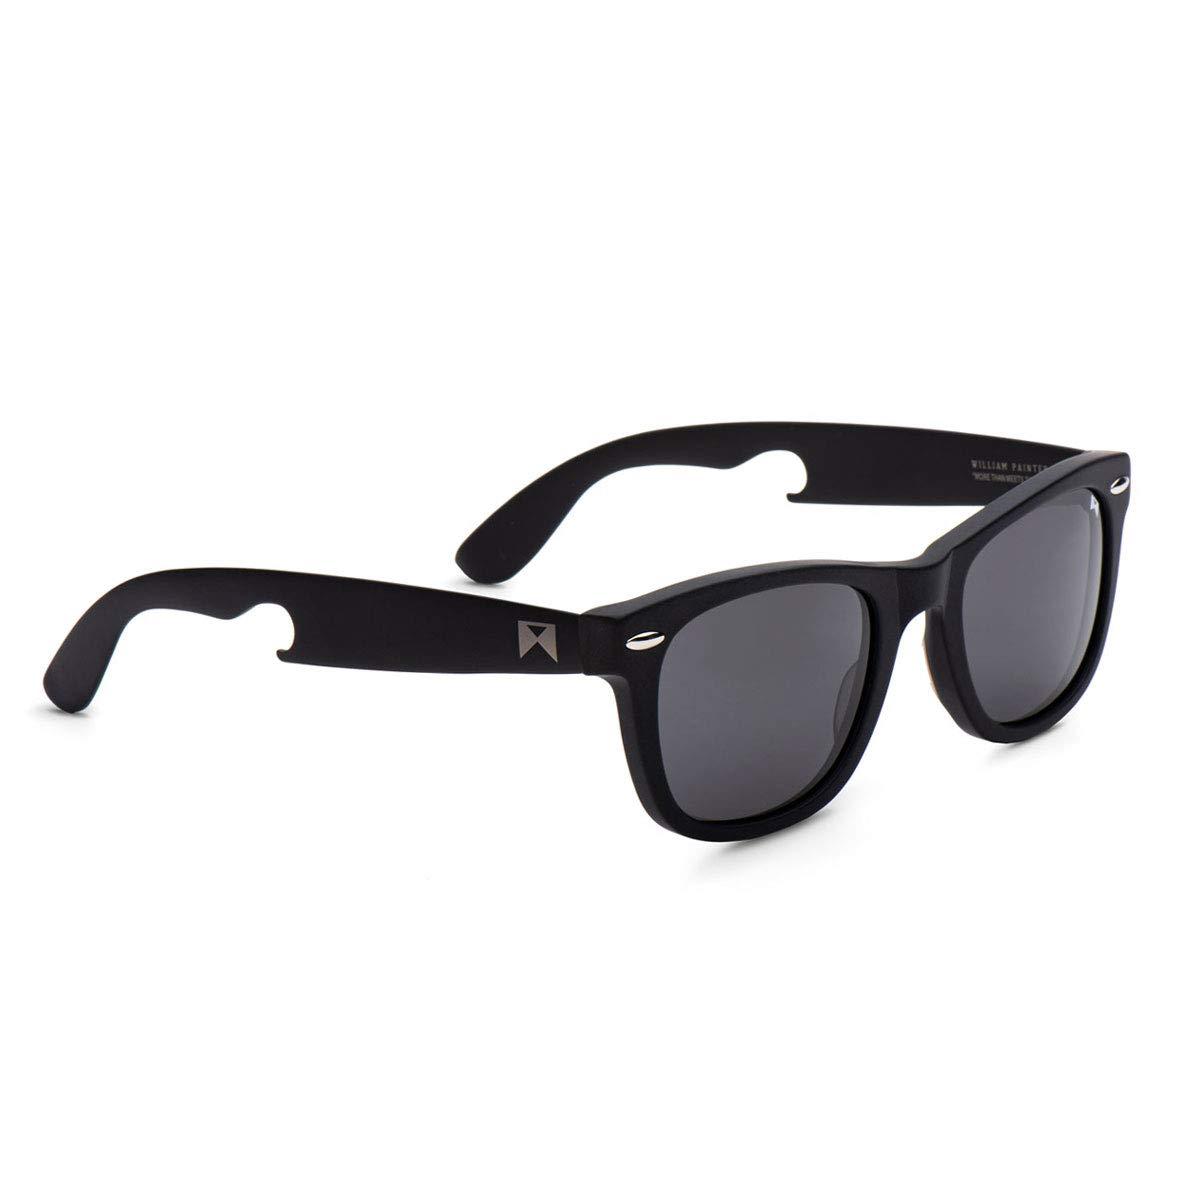 3a893d09bc Amazon.com  William Painter - The Hook Titanium Polarized  Classic   Sunglasses  Shoes